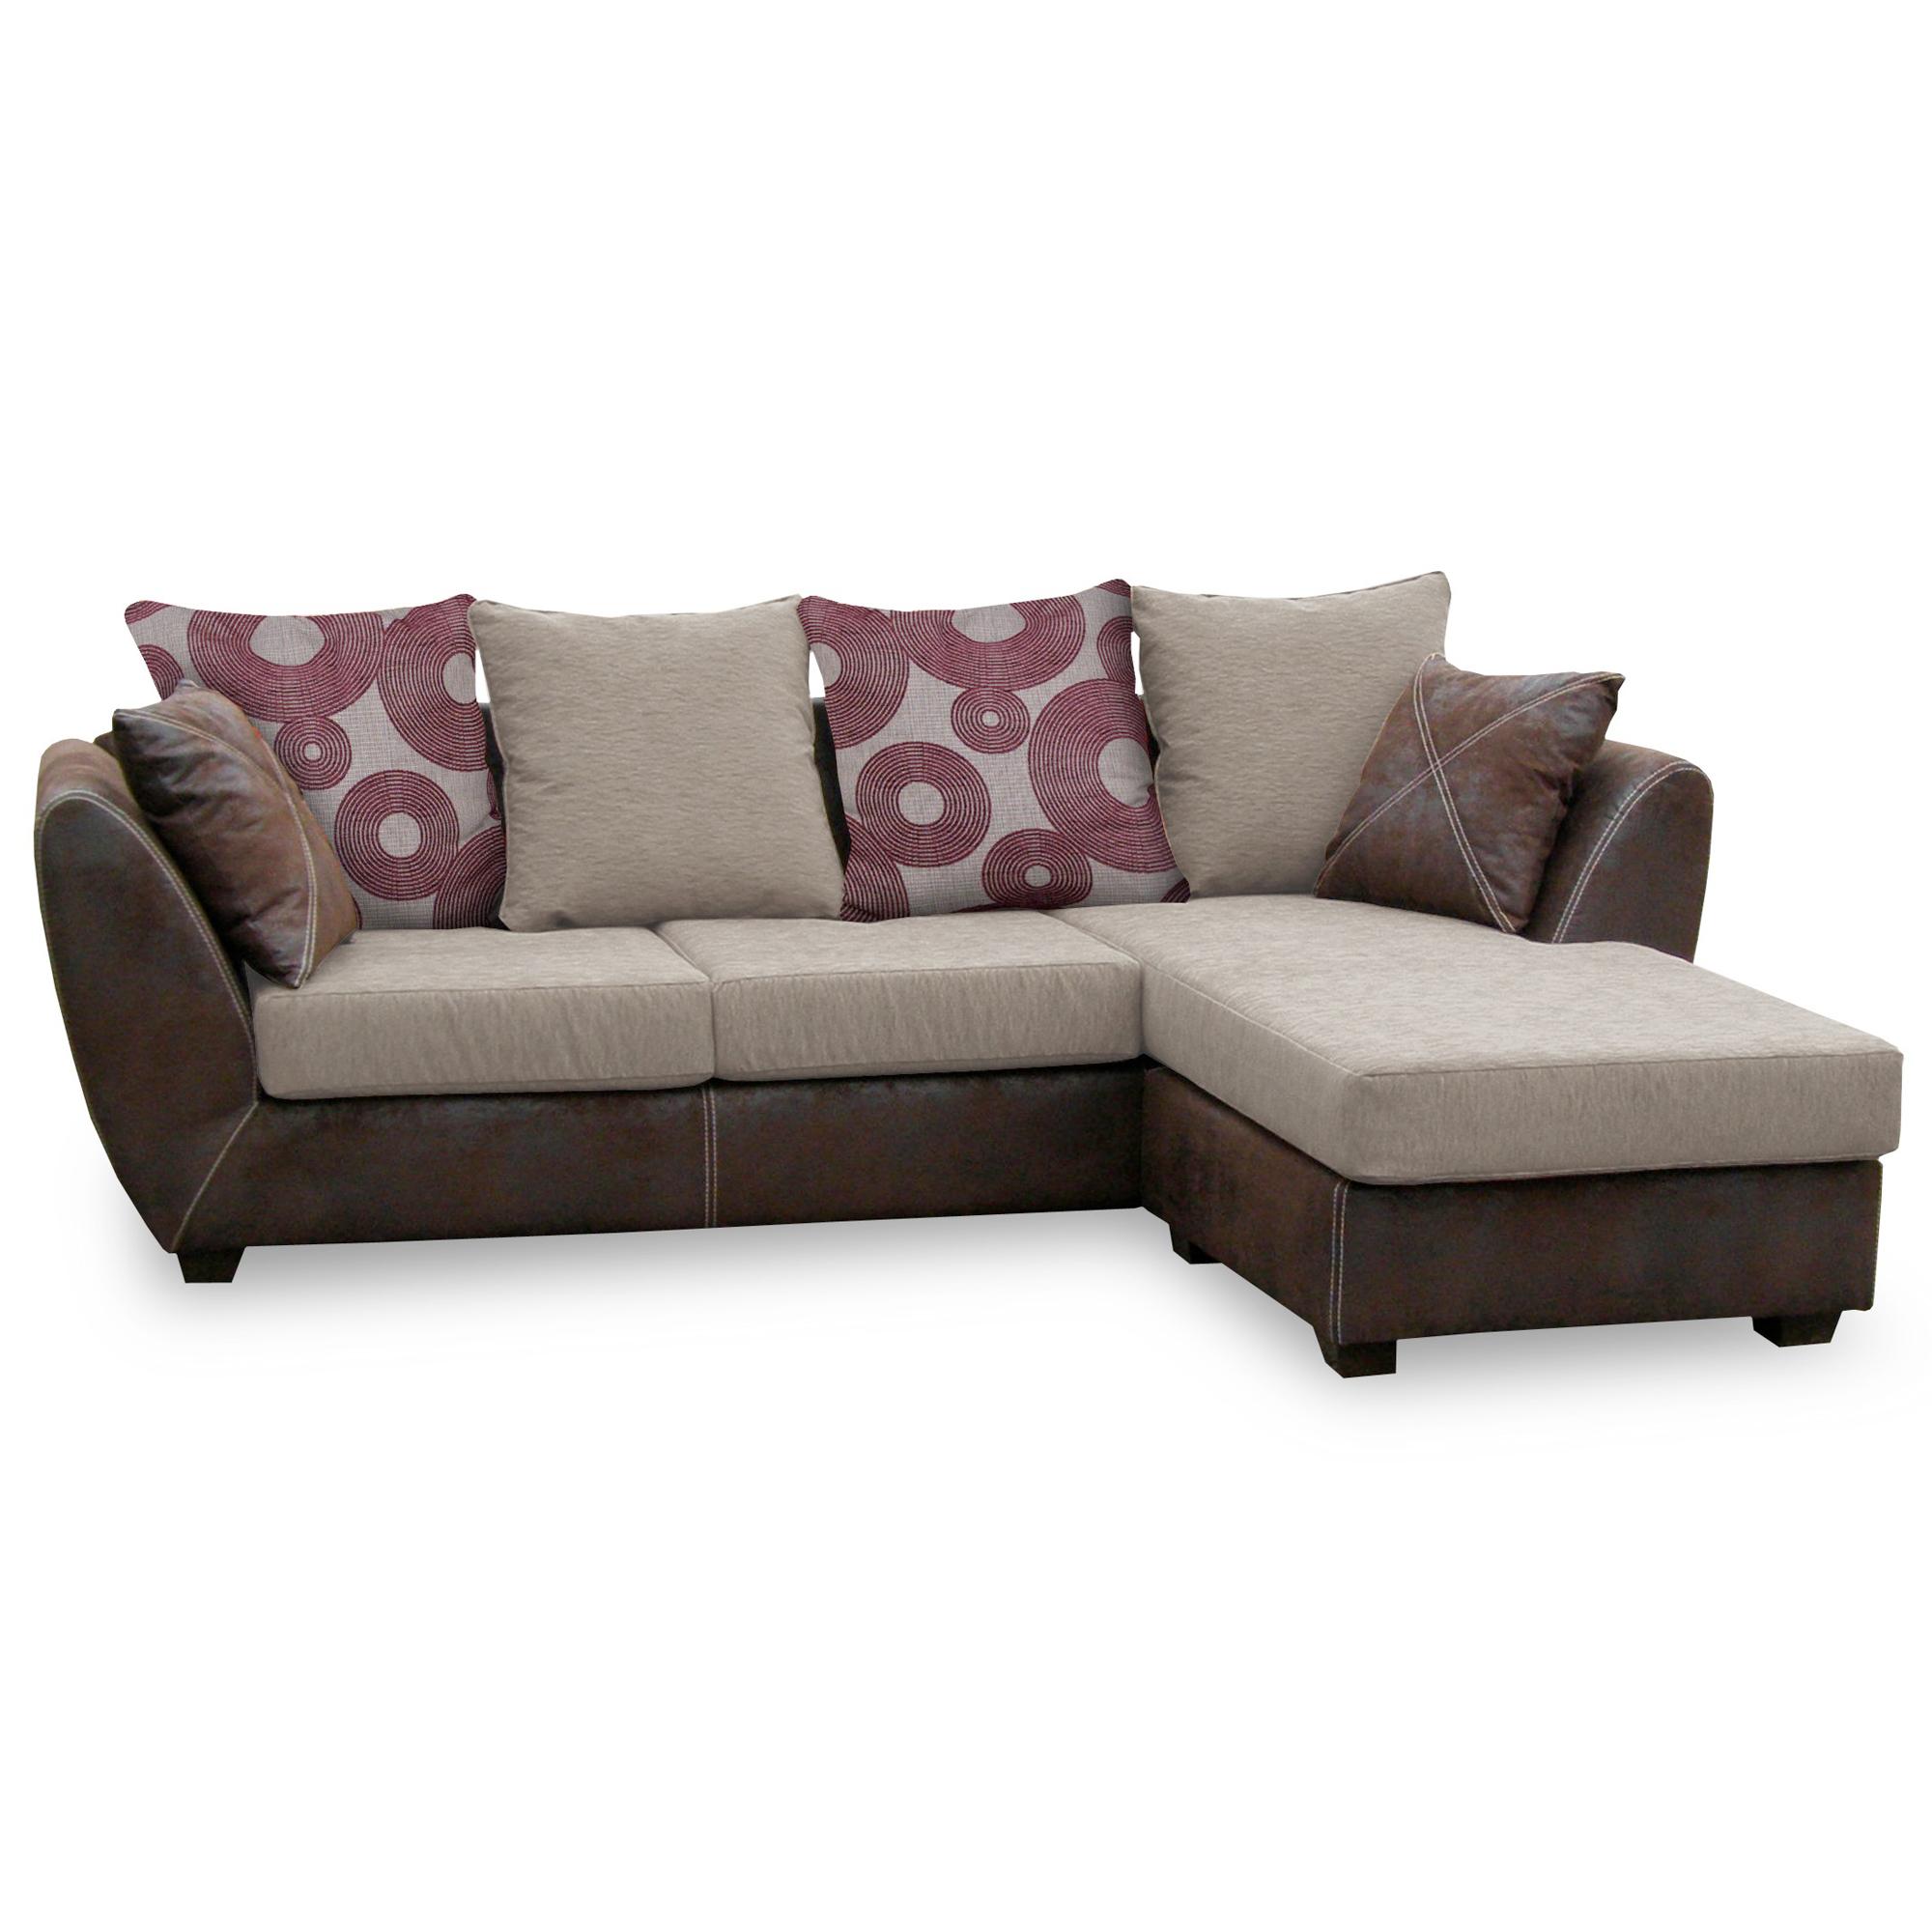 canap la maison de valerie canap d 39 angle r versible ceylon cappuccino. Black Bedroom Furniture Sets. Home Design Ideas